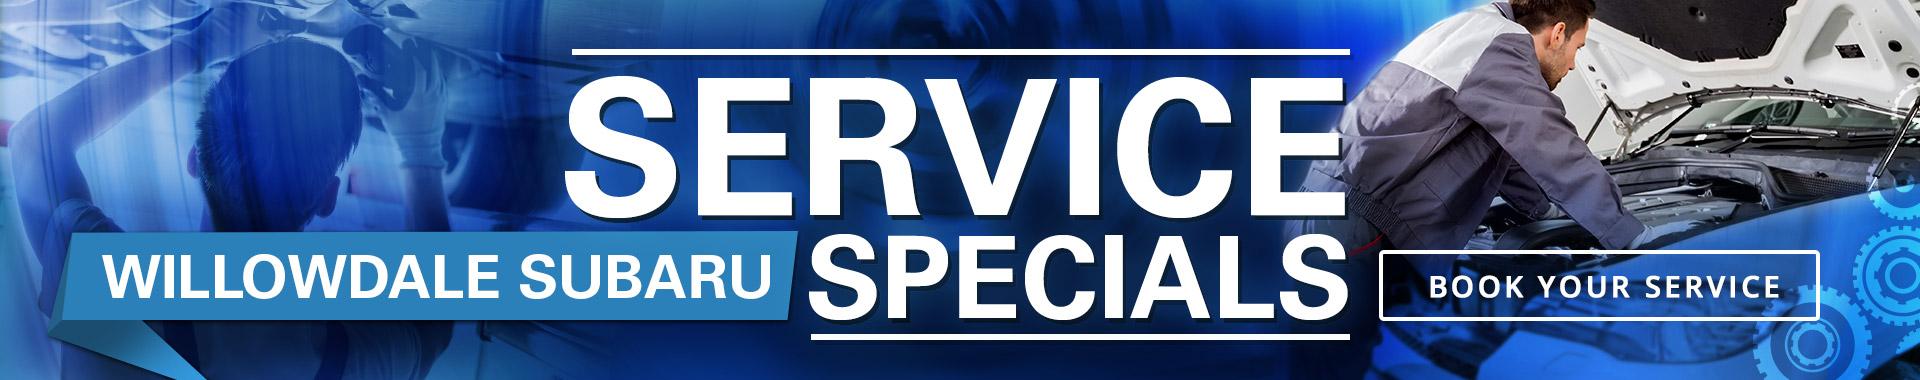 Willowdale Subaru Service and Repairs